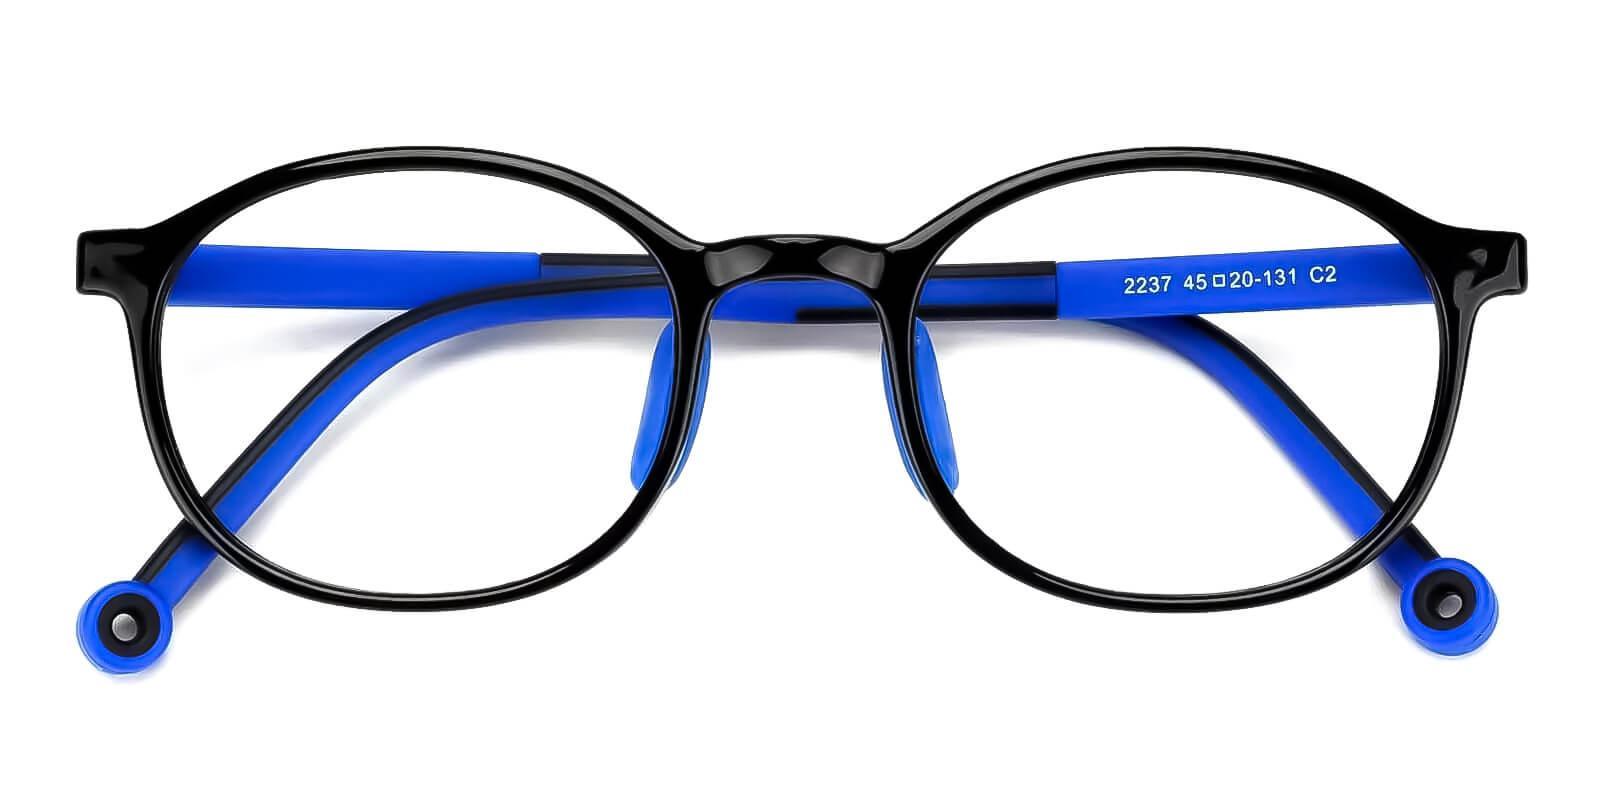 Kids-Exquisite Blue TR Eyeglasses , Fashion , UniversalBridgeFit Frames from ABBE Glasses